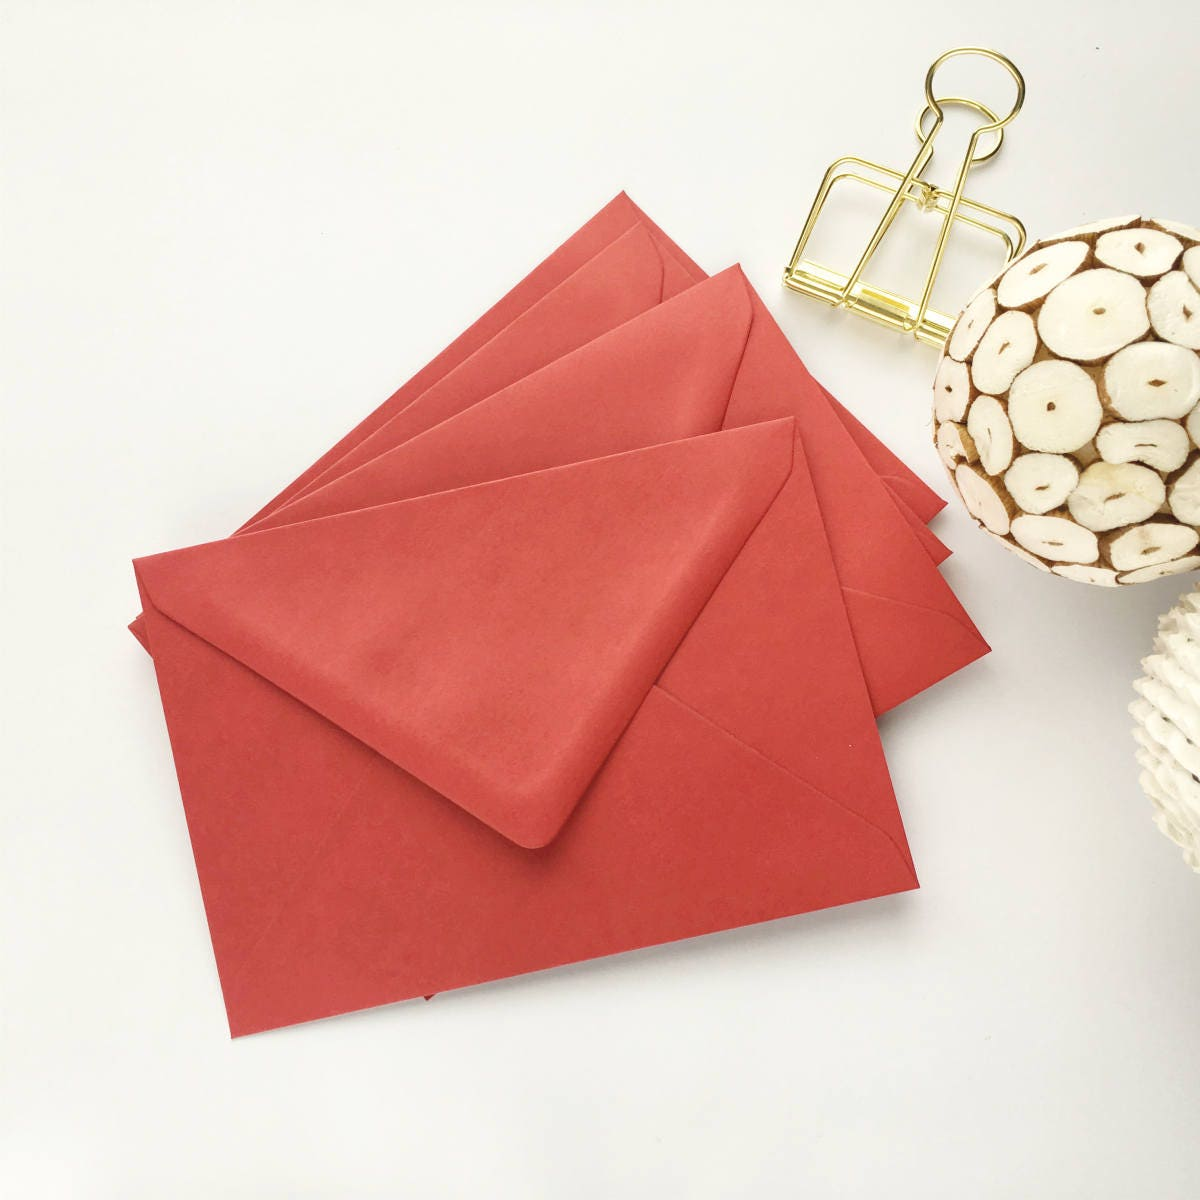 200 Red 4x6 Envelopes A6 C6 Bulk Envelopes Christmas Envelopes also ...